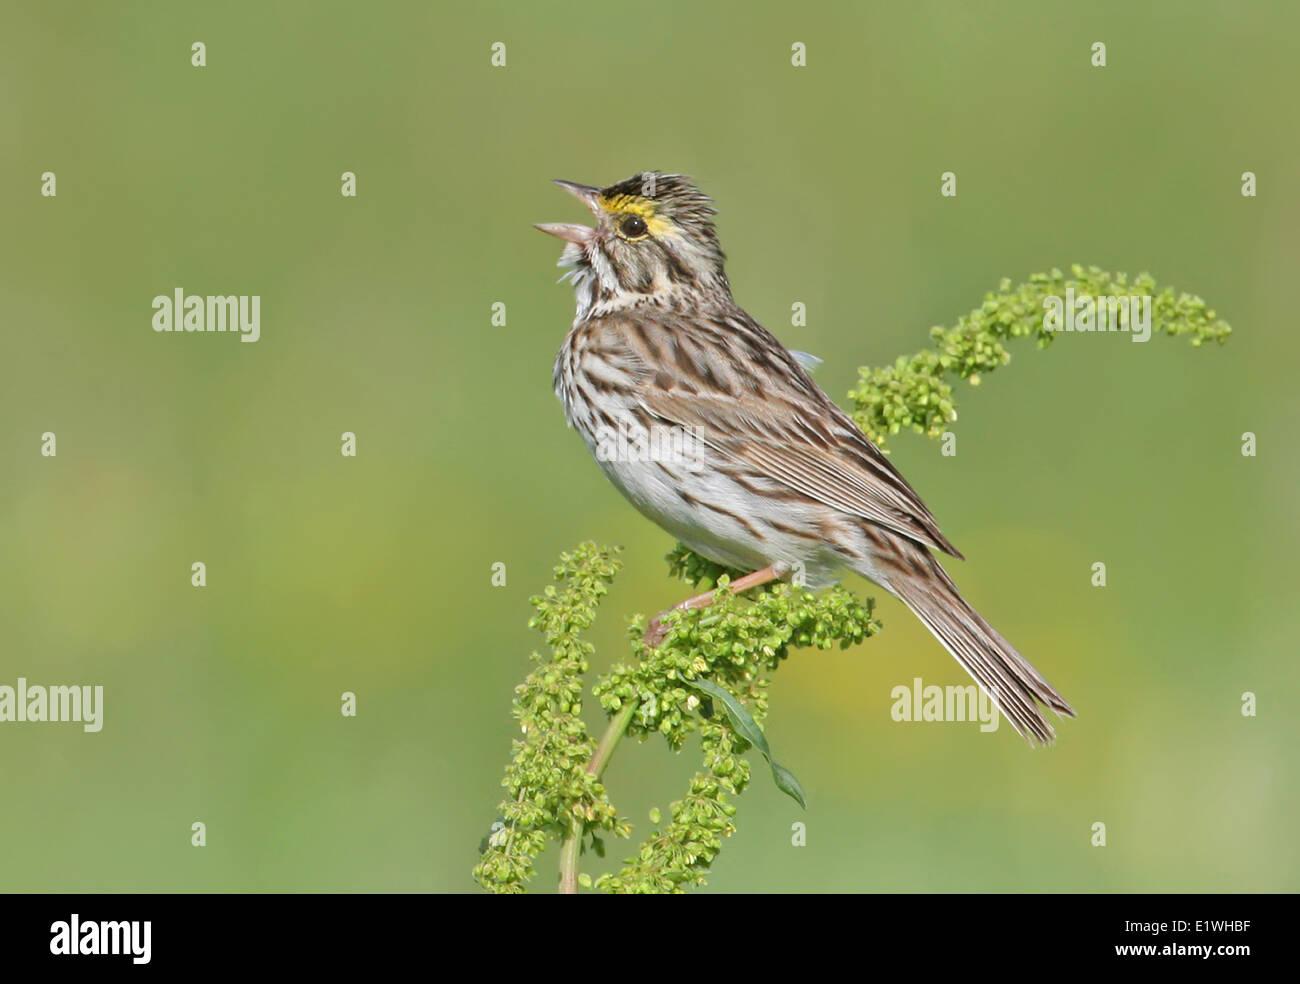 Savannah Sparrow, Passerculus sandwichensis, sings from a wildlfower near Saskatoon, Saskatchewan Stock Photo